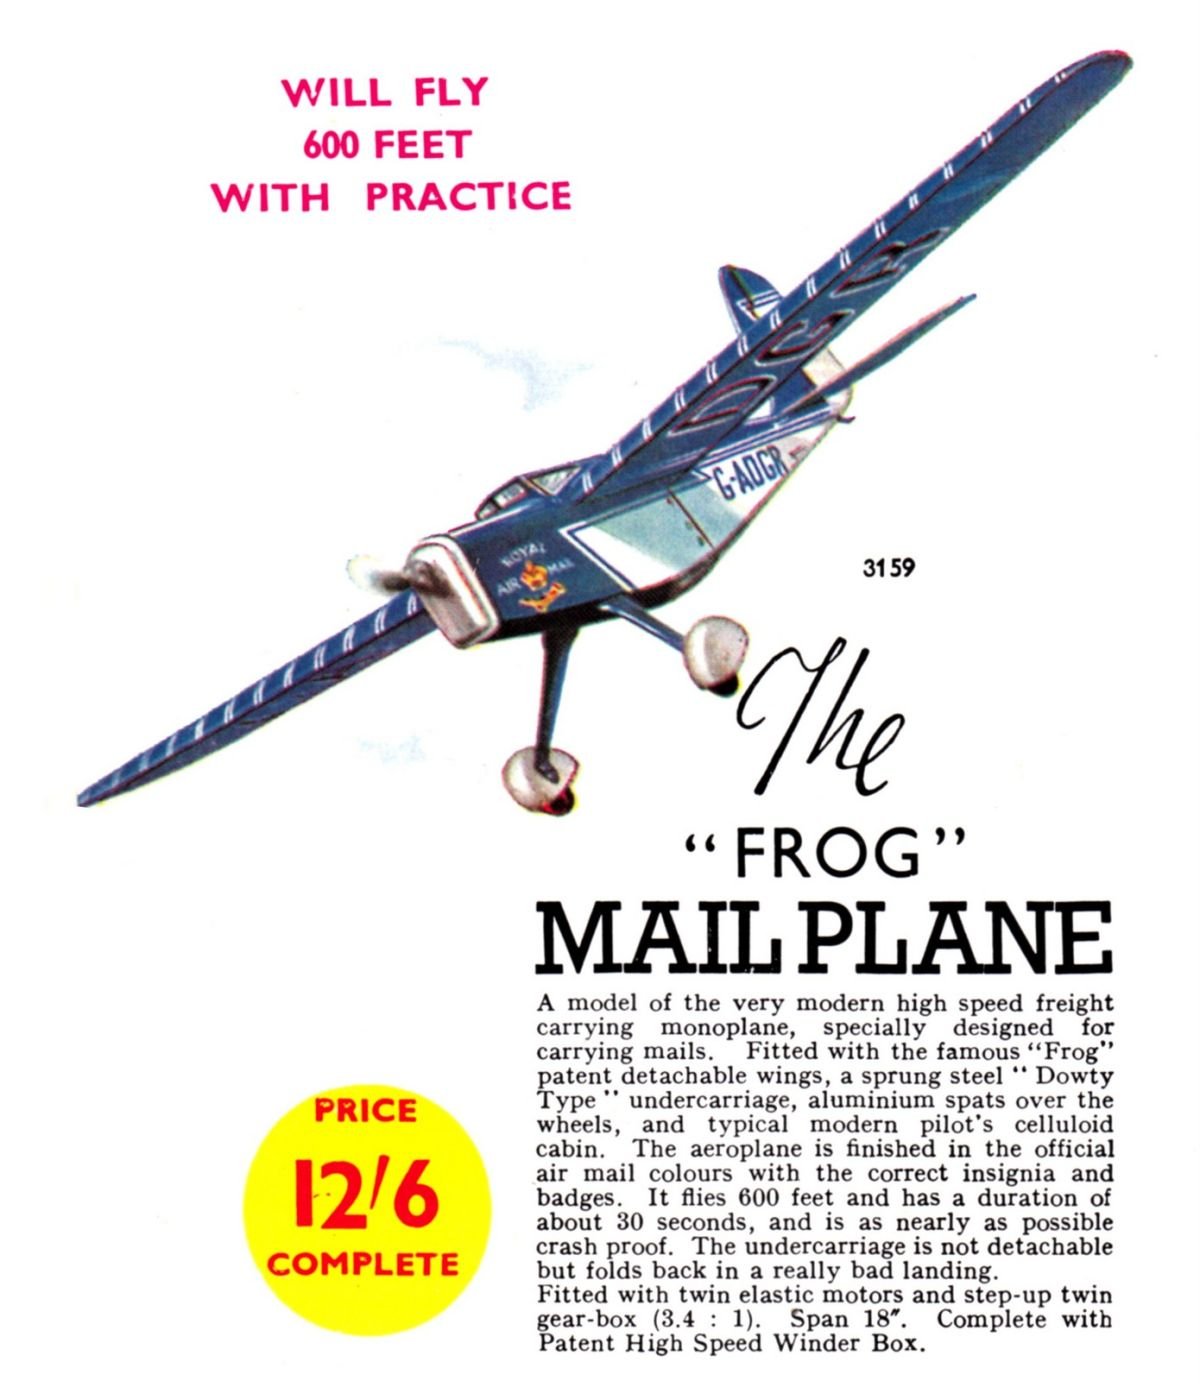 FROG Mailplane, Flying Model (Triang)